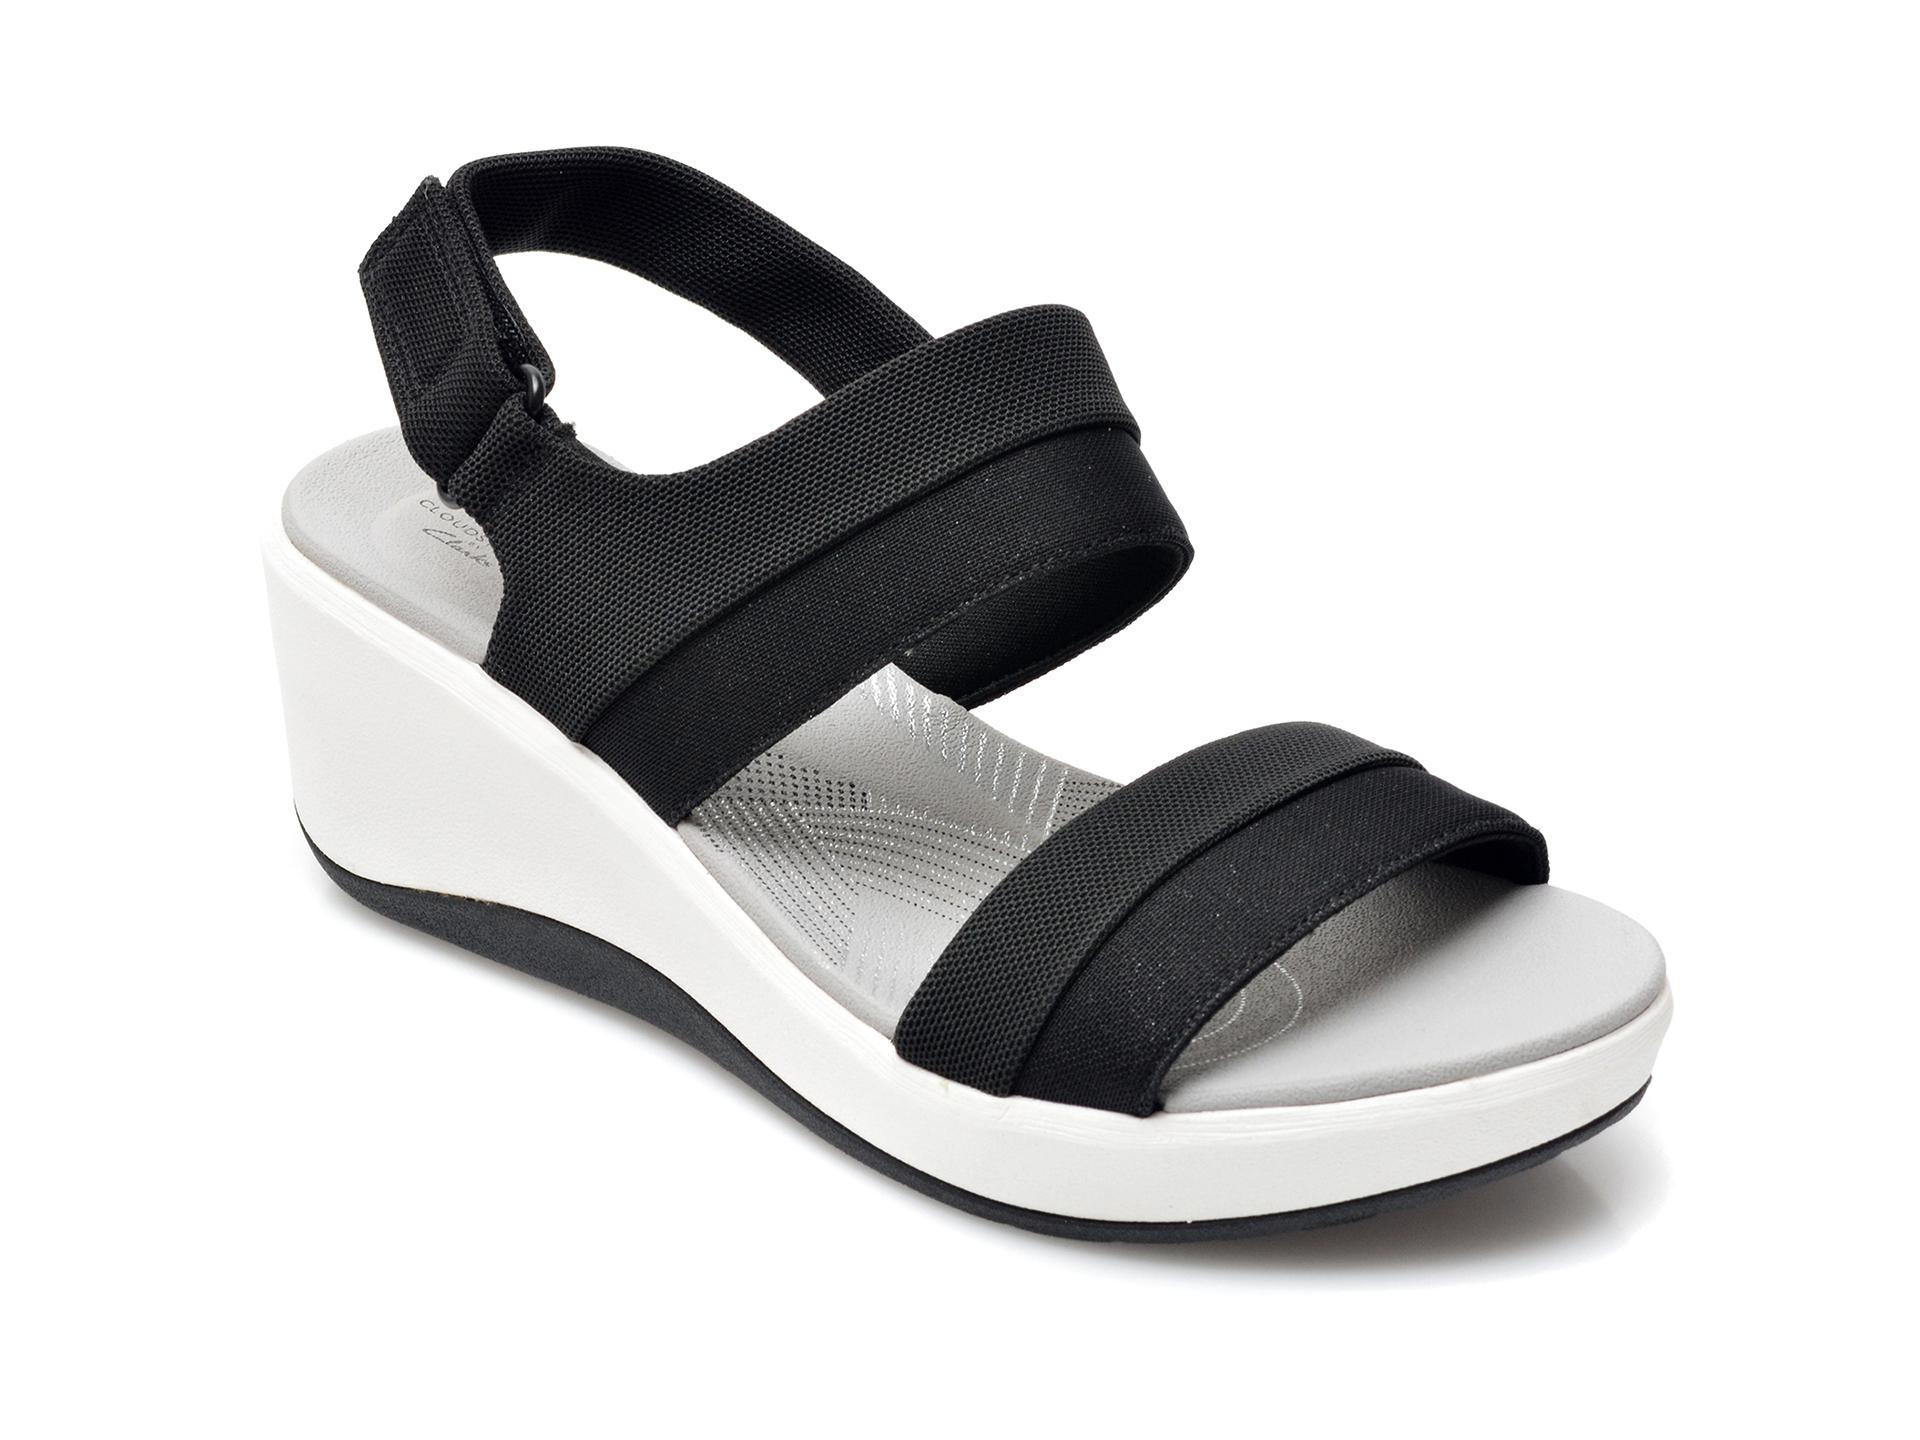 Sandale CLARKS negre, Step Cali Muir, din material textil imagine otter.ro 2021